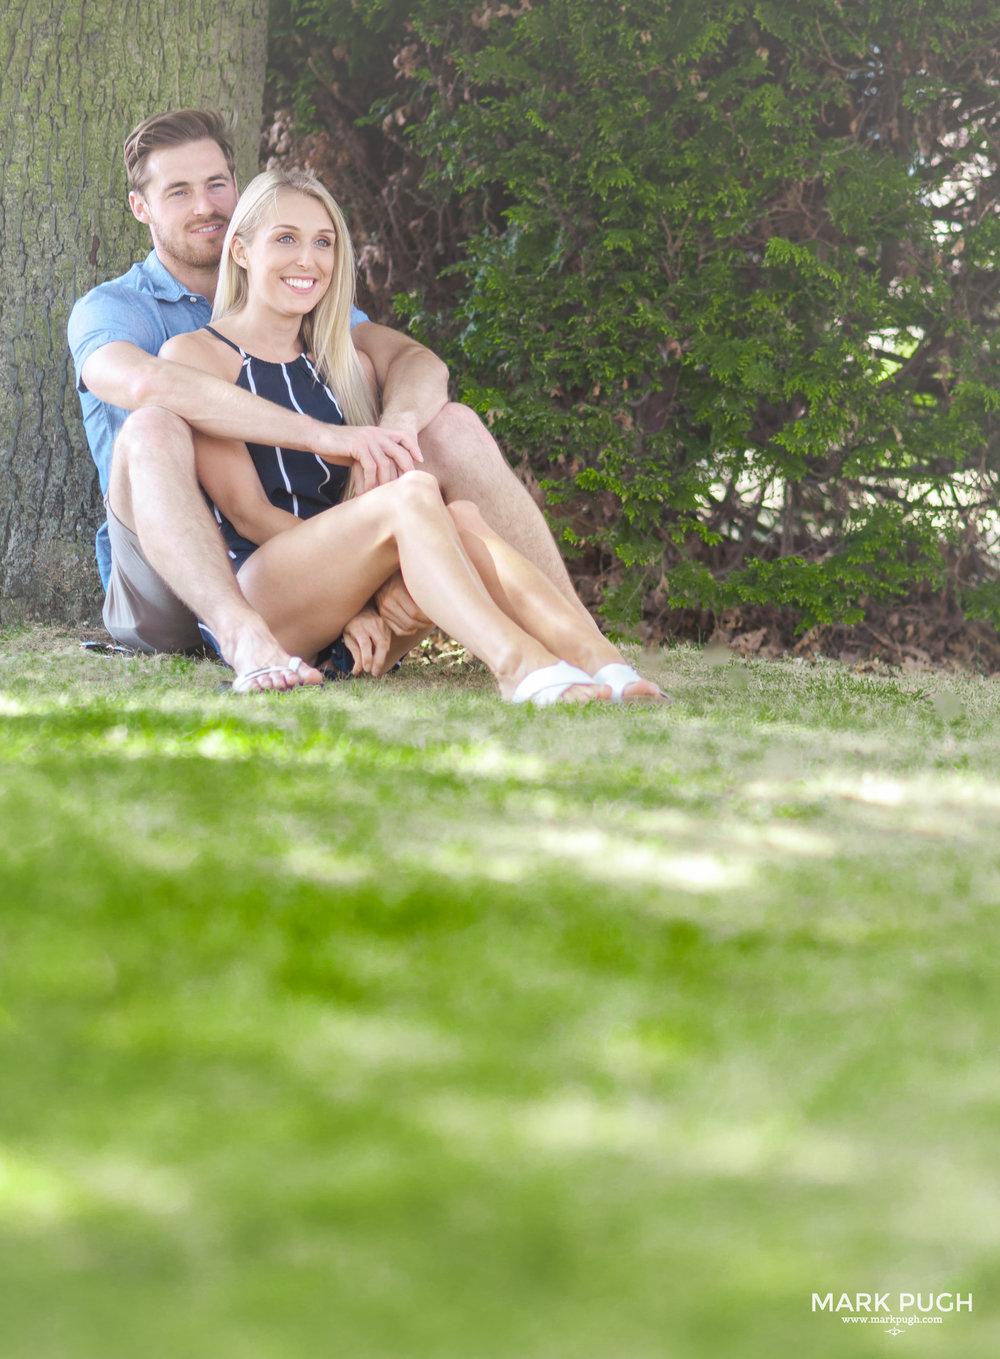 019 - Lucy and Steven - fineART preWED photography by www.markpugh.com Mark Pugh of www.mpmedia.co.uk_.JPG